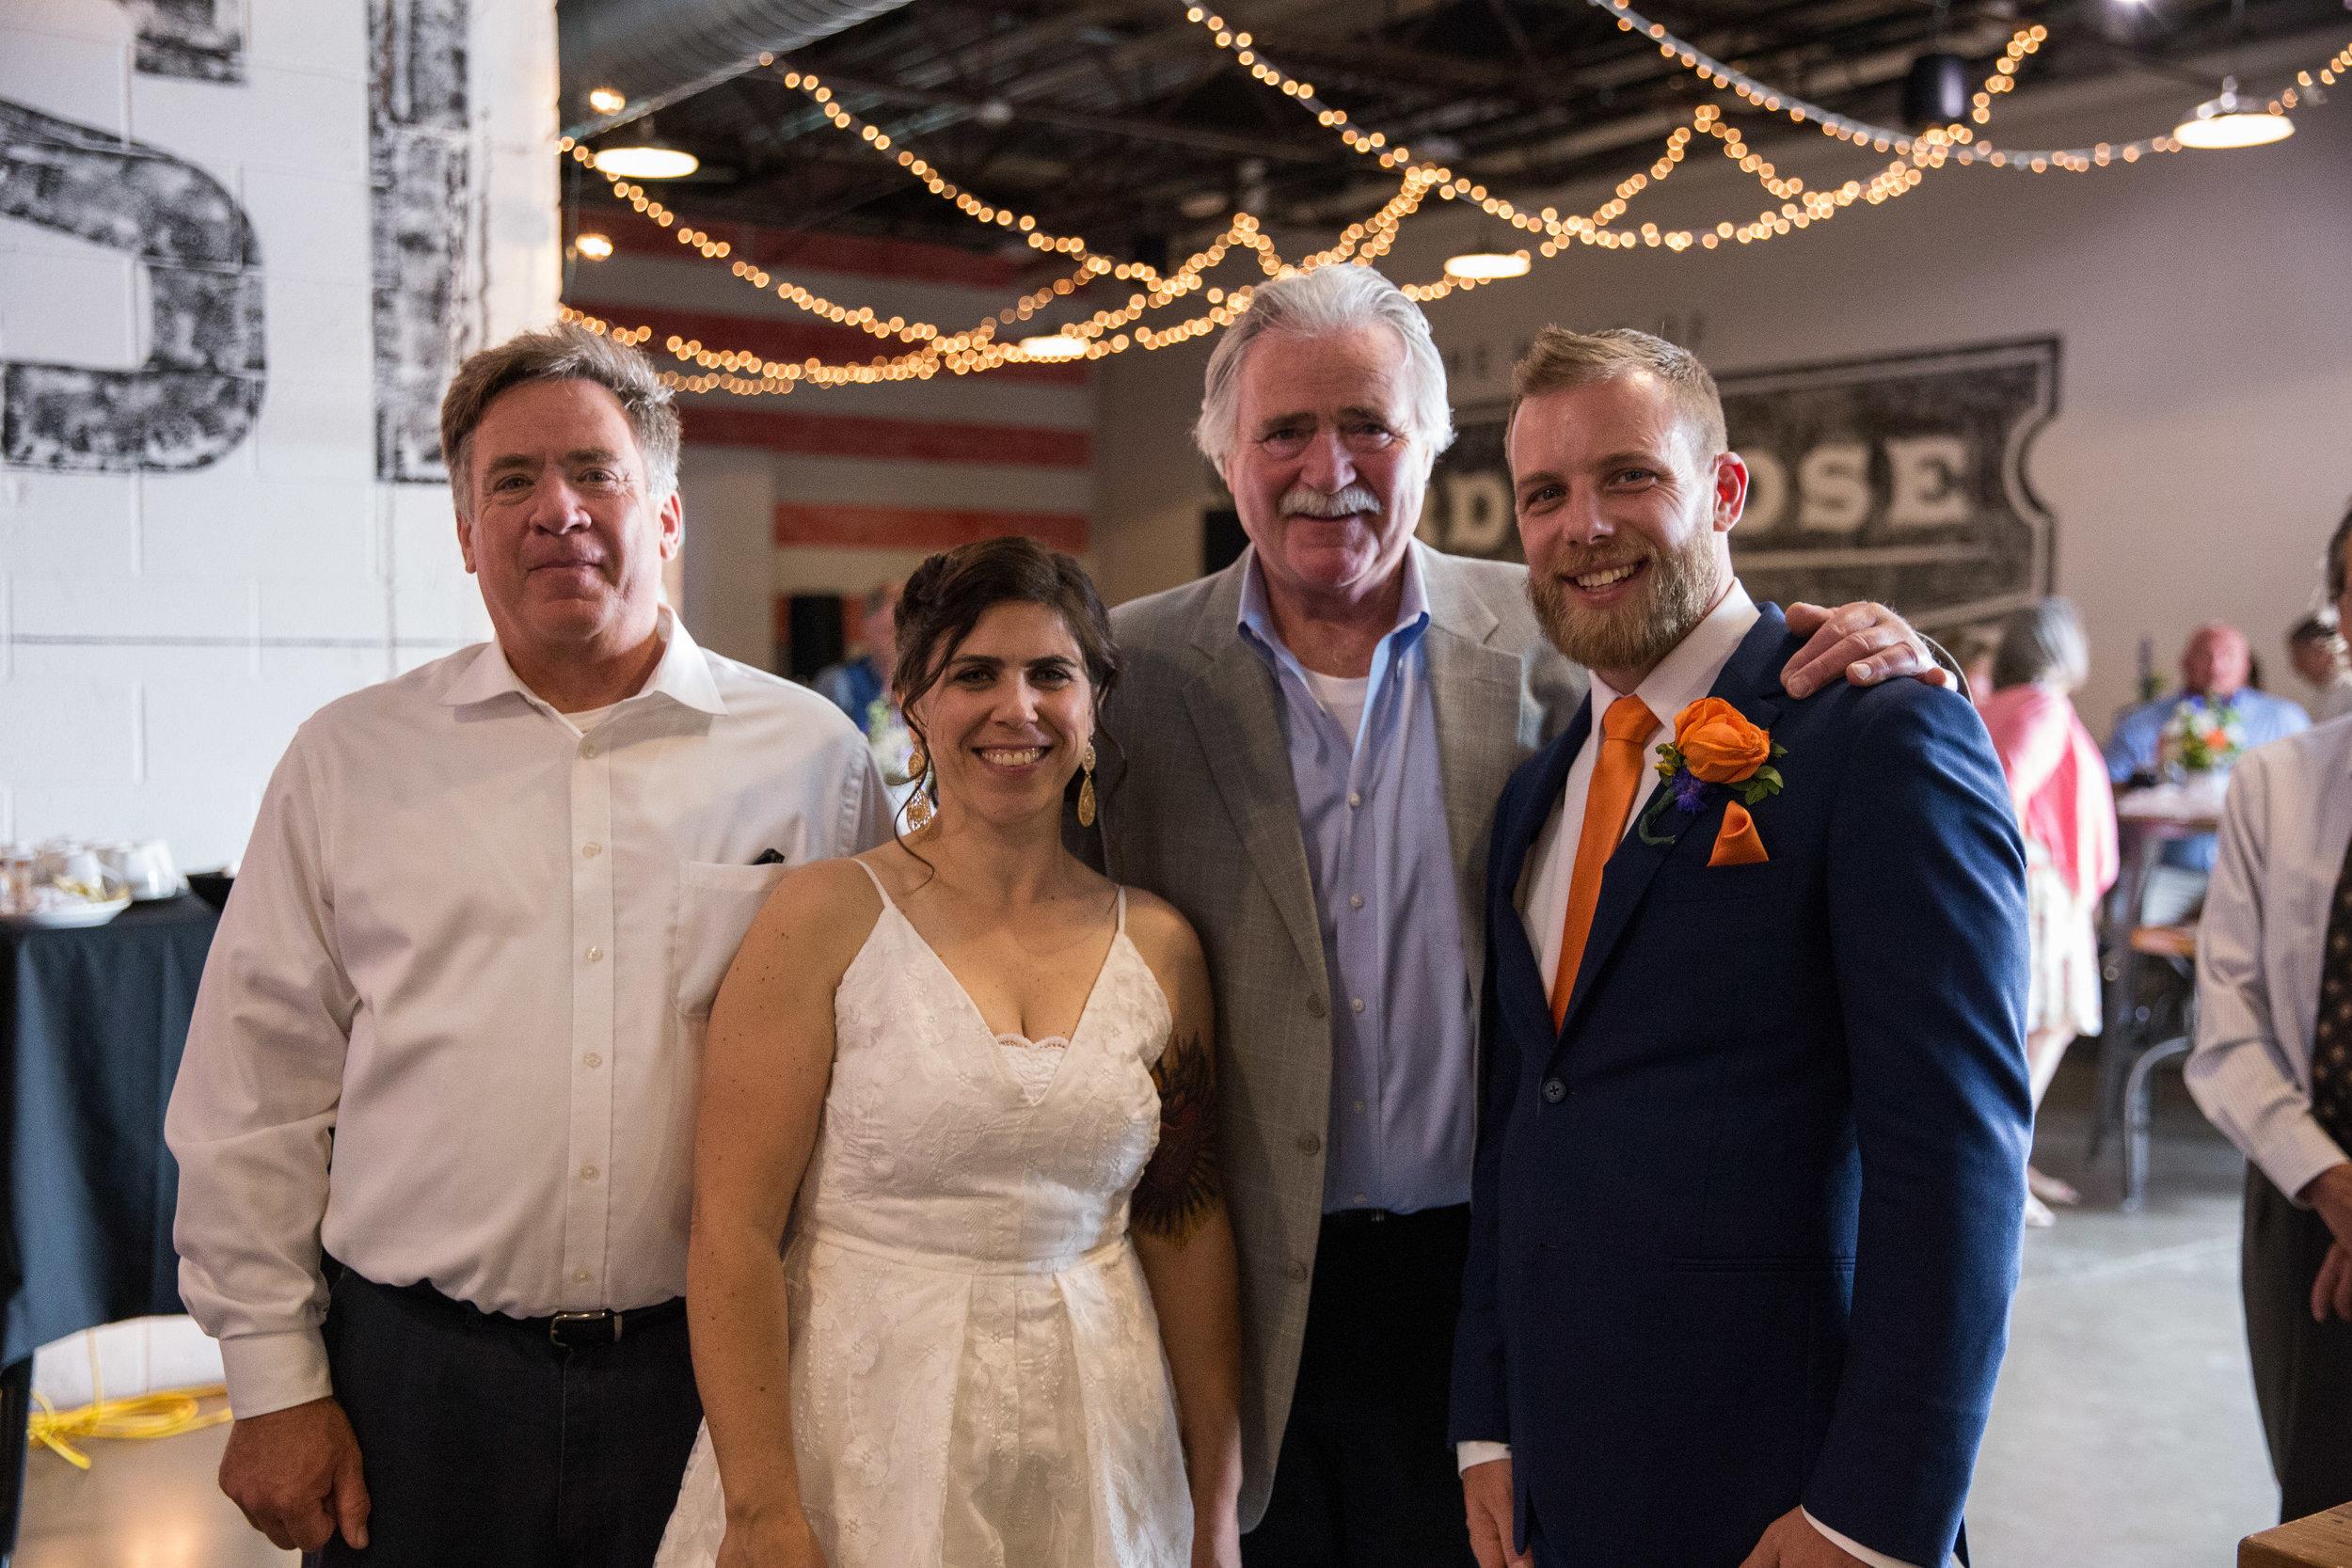 Natalie and Dallas Mooney Wedding 6-8-19_Tania Watt Photography-563.jpg